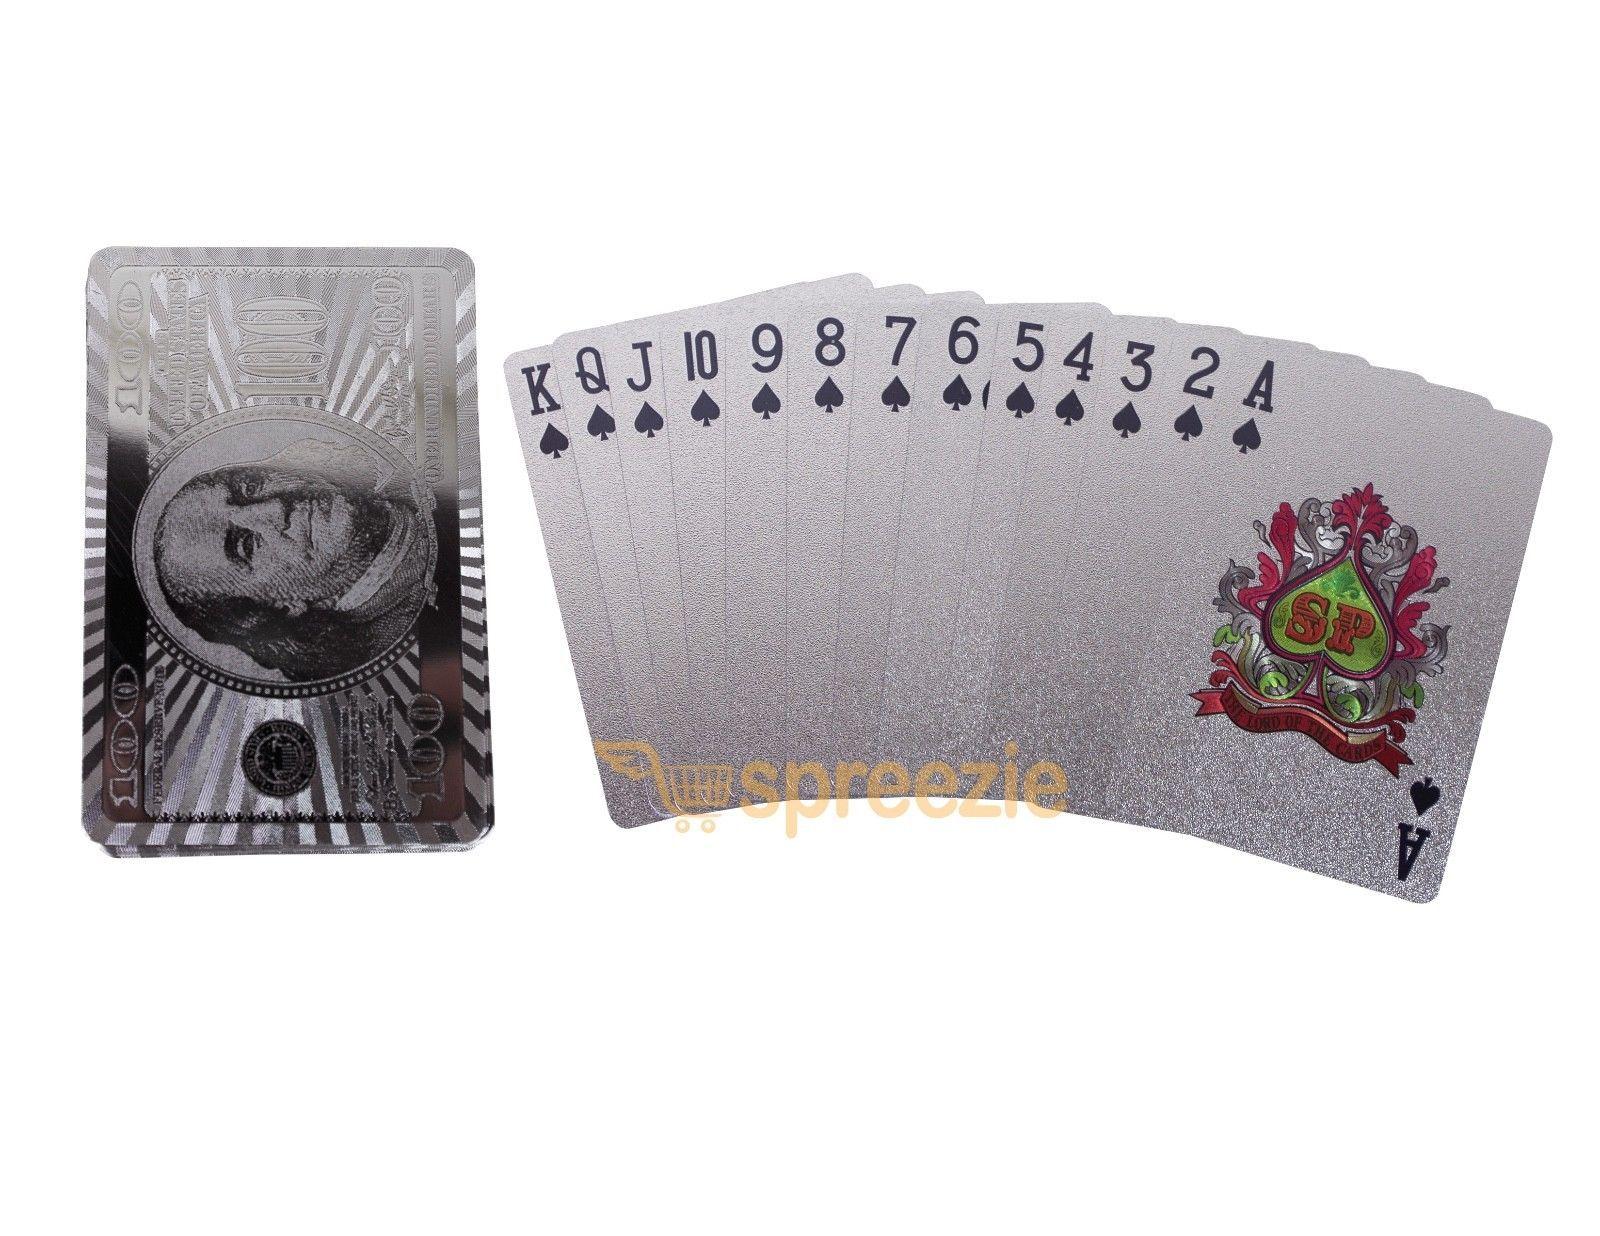 $100 Bill Gold Playing Cards 24k Foil Plated Full Deck Poker Benjamin Franklin 3